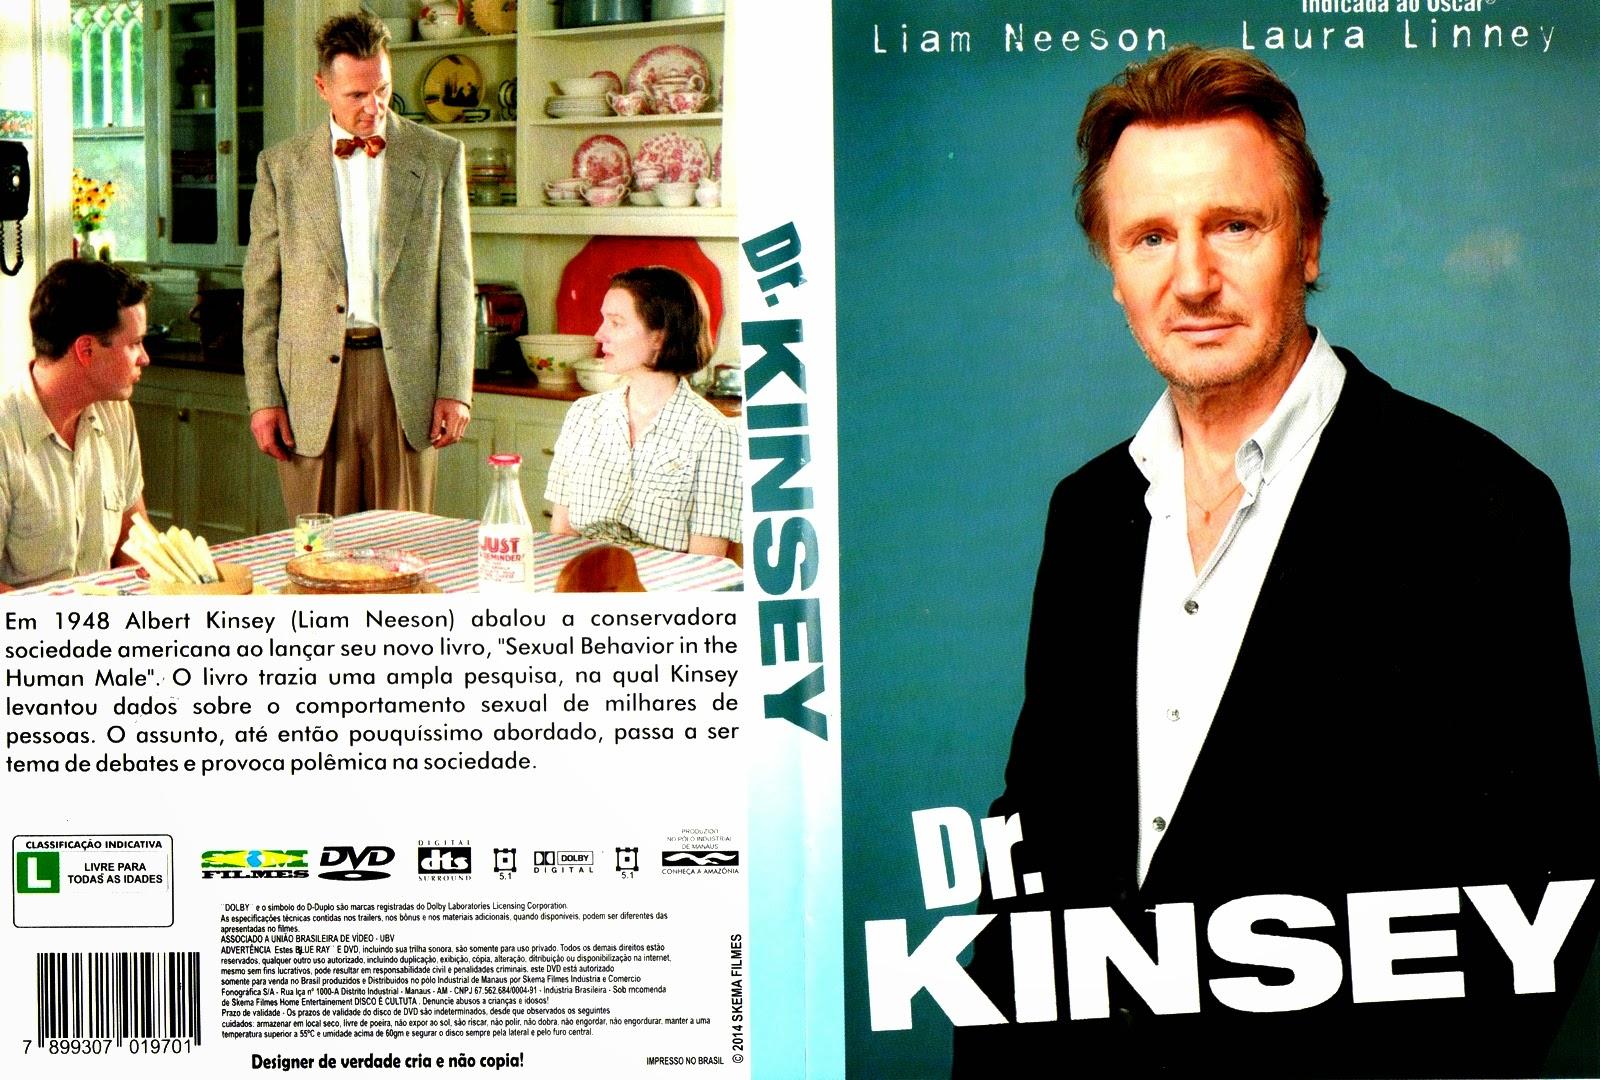 CAPAS X FILMES: DR. KINSEY